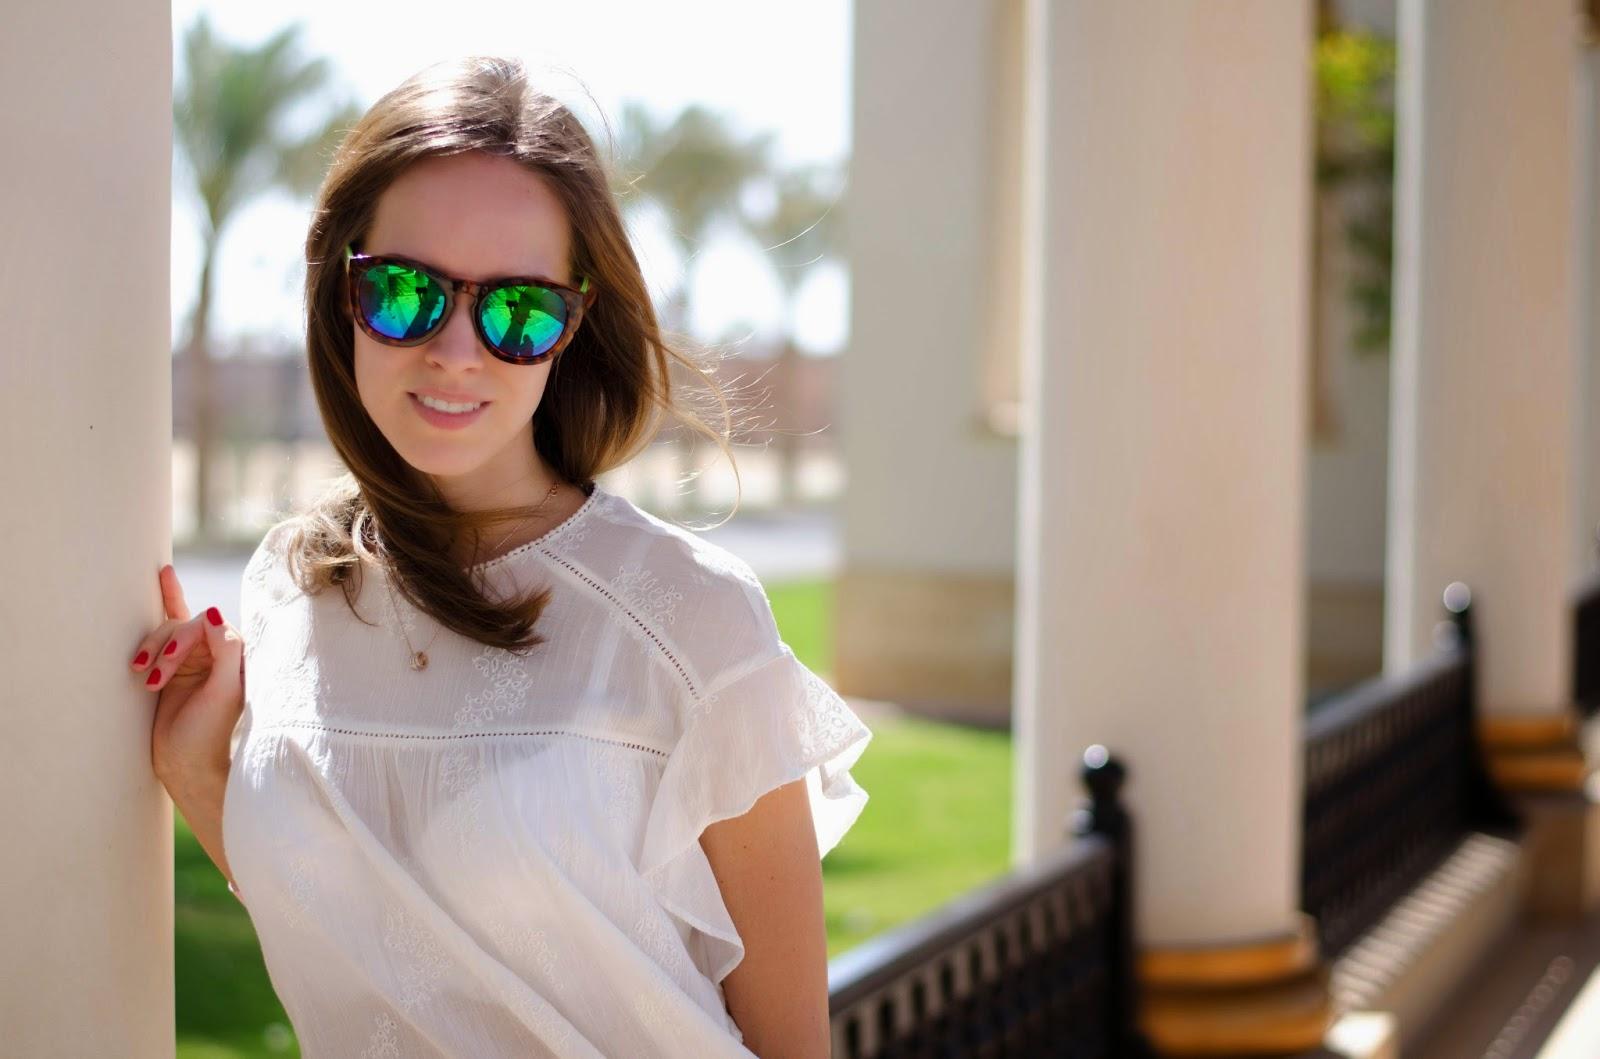 kristjaana mere sahl hasheesh zara white top lindex mirror sunglasses summer trend